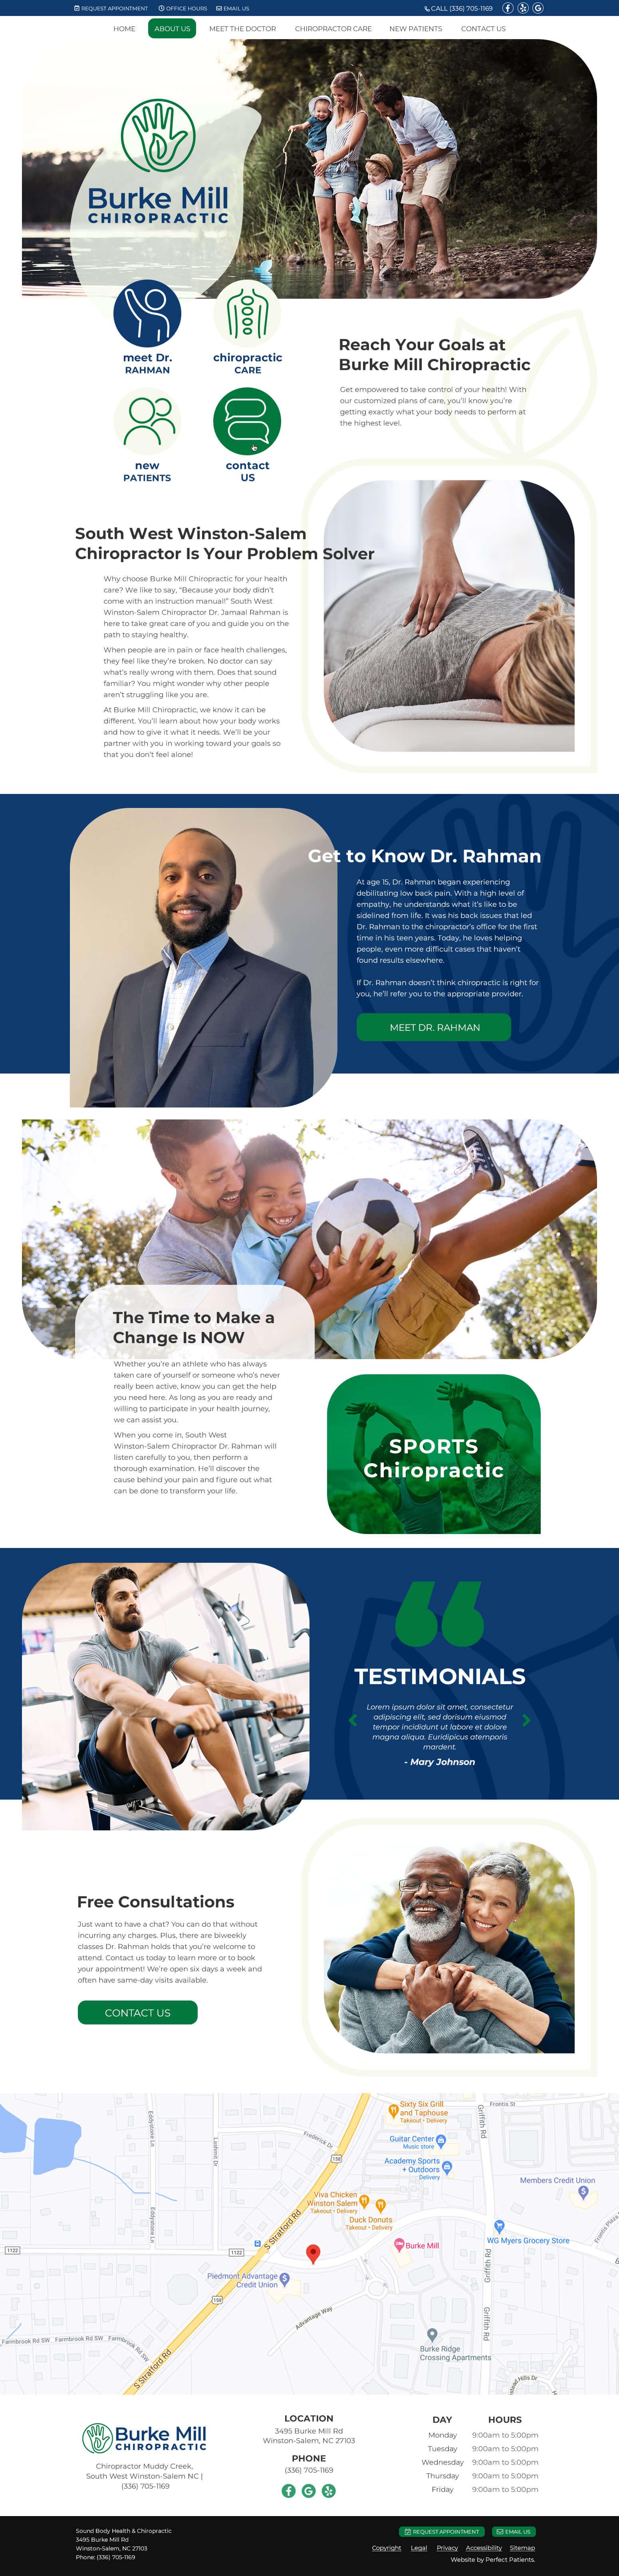 BMC website with stock photos